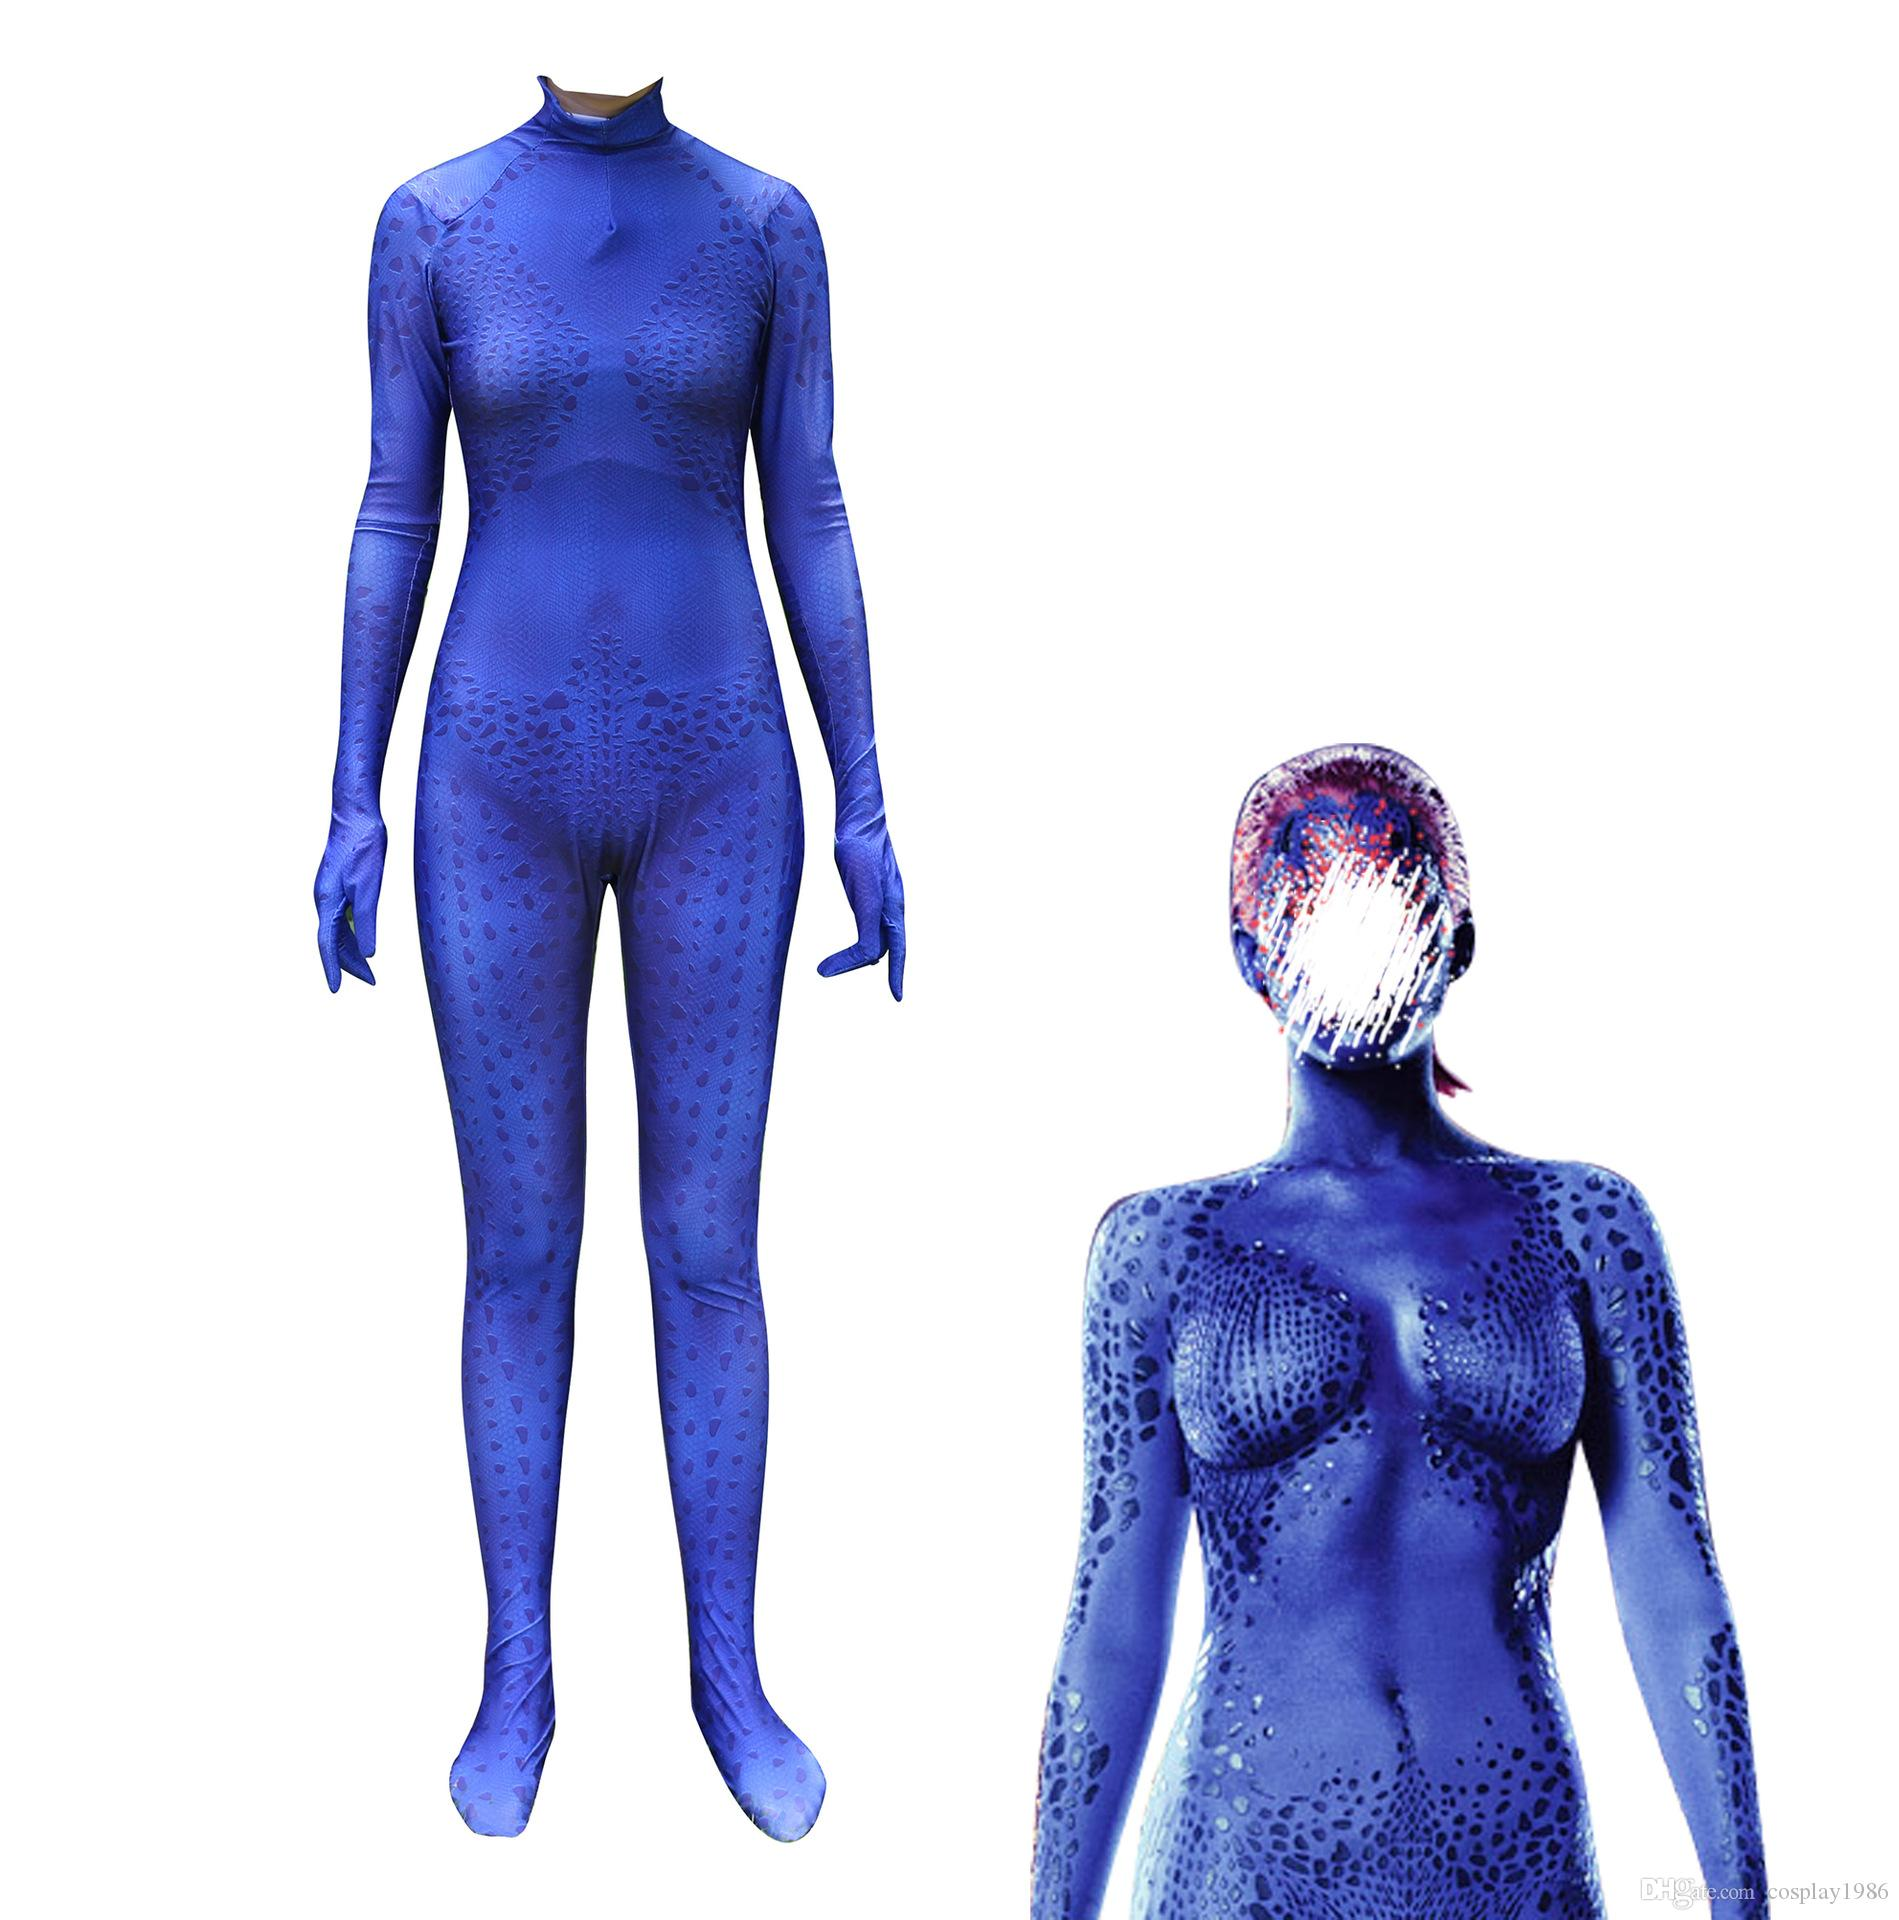 86b4021131291 2019 Cosplay X Men Mystique Raven Darkholme Women Female Costume Halloween  Party Superhero Plugsuit Jumpsuits Suit Catsuit Zentai From Cosplay1986, ...